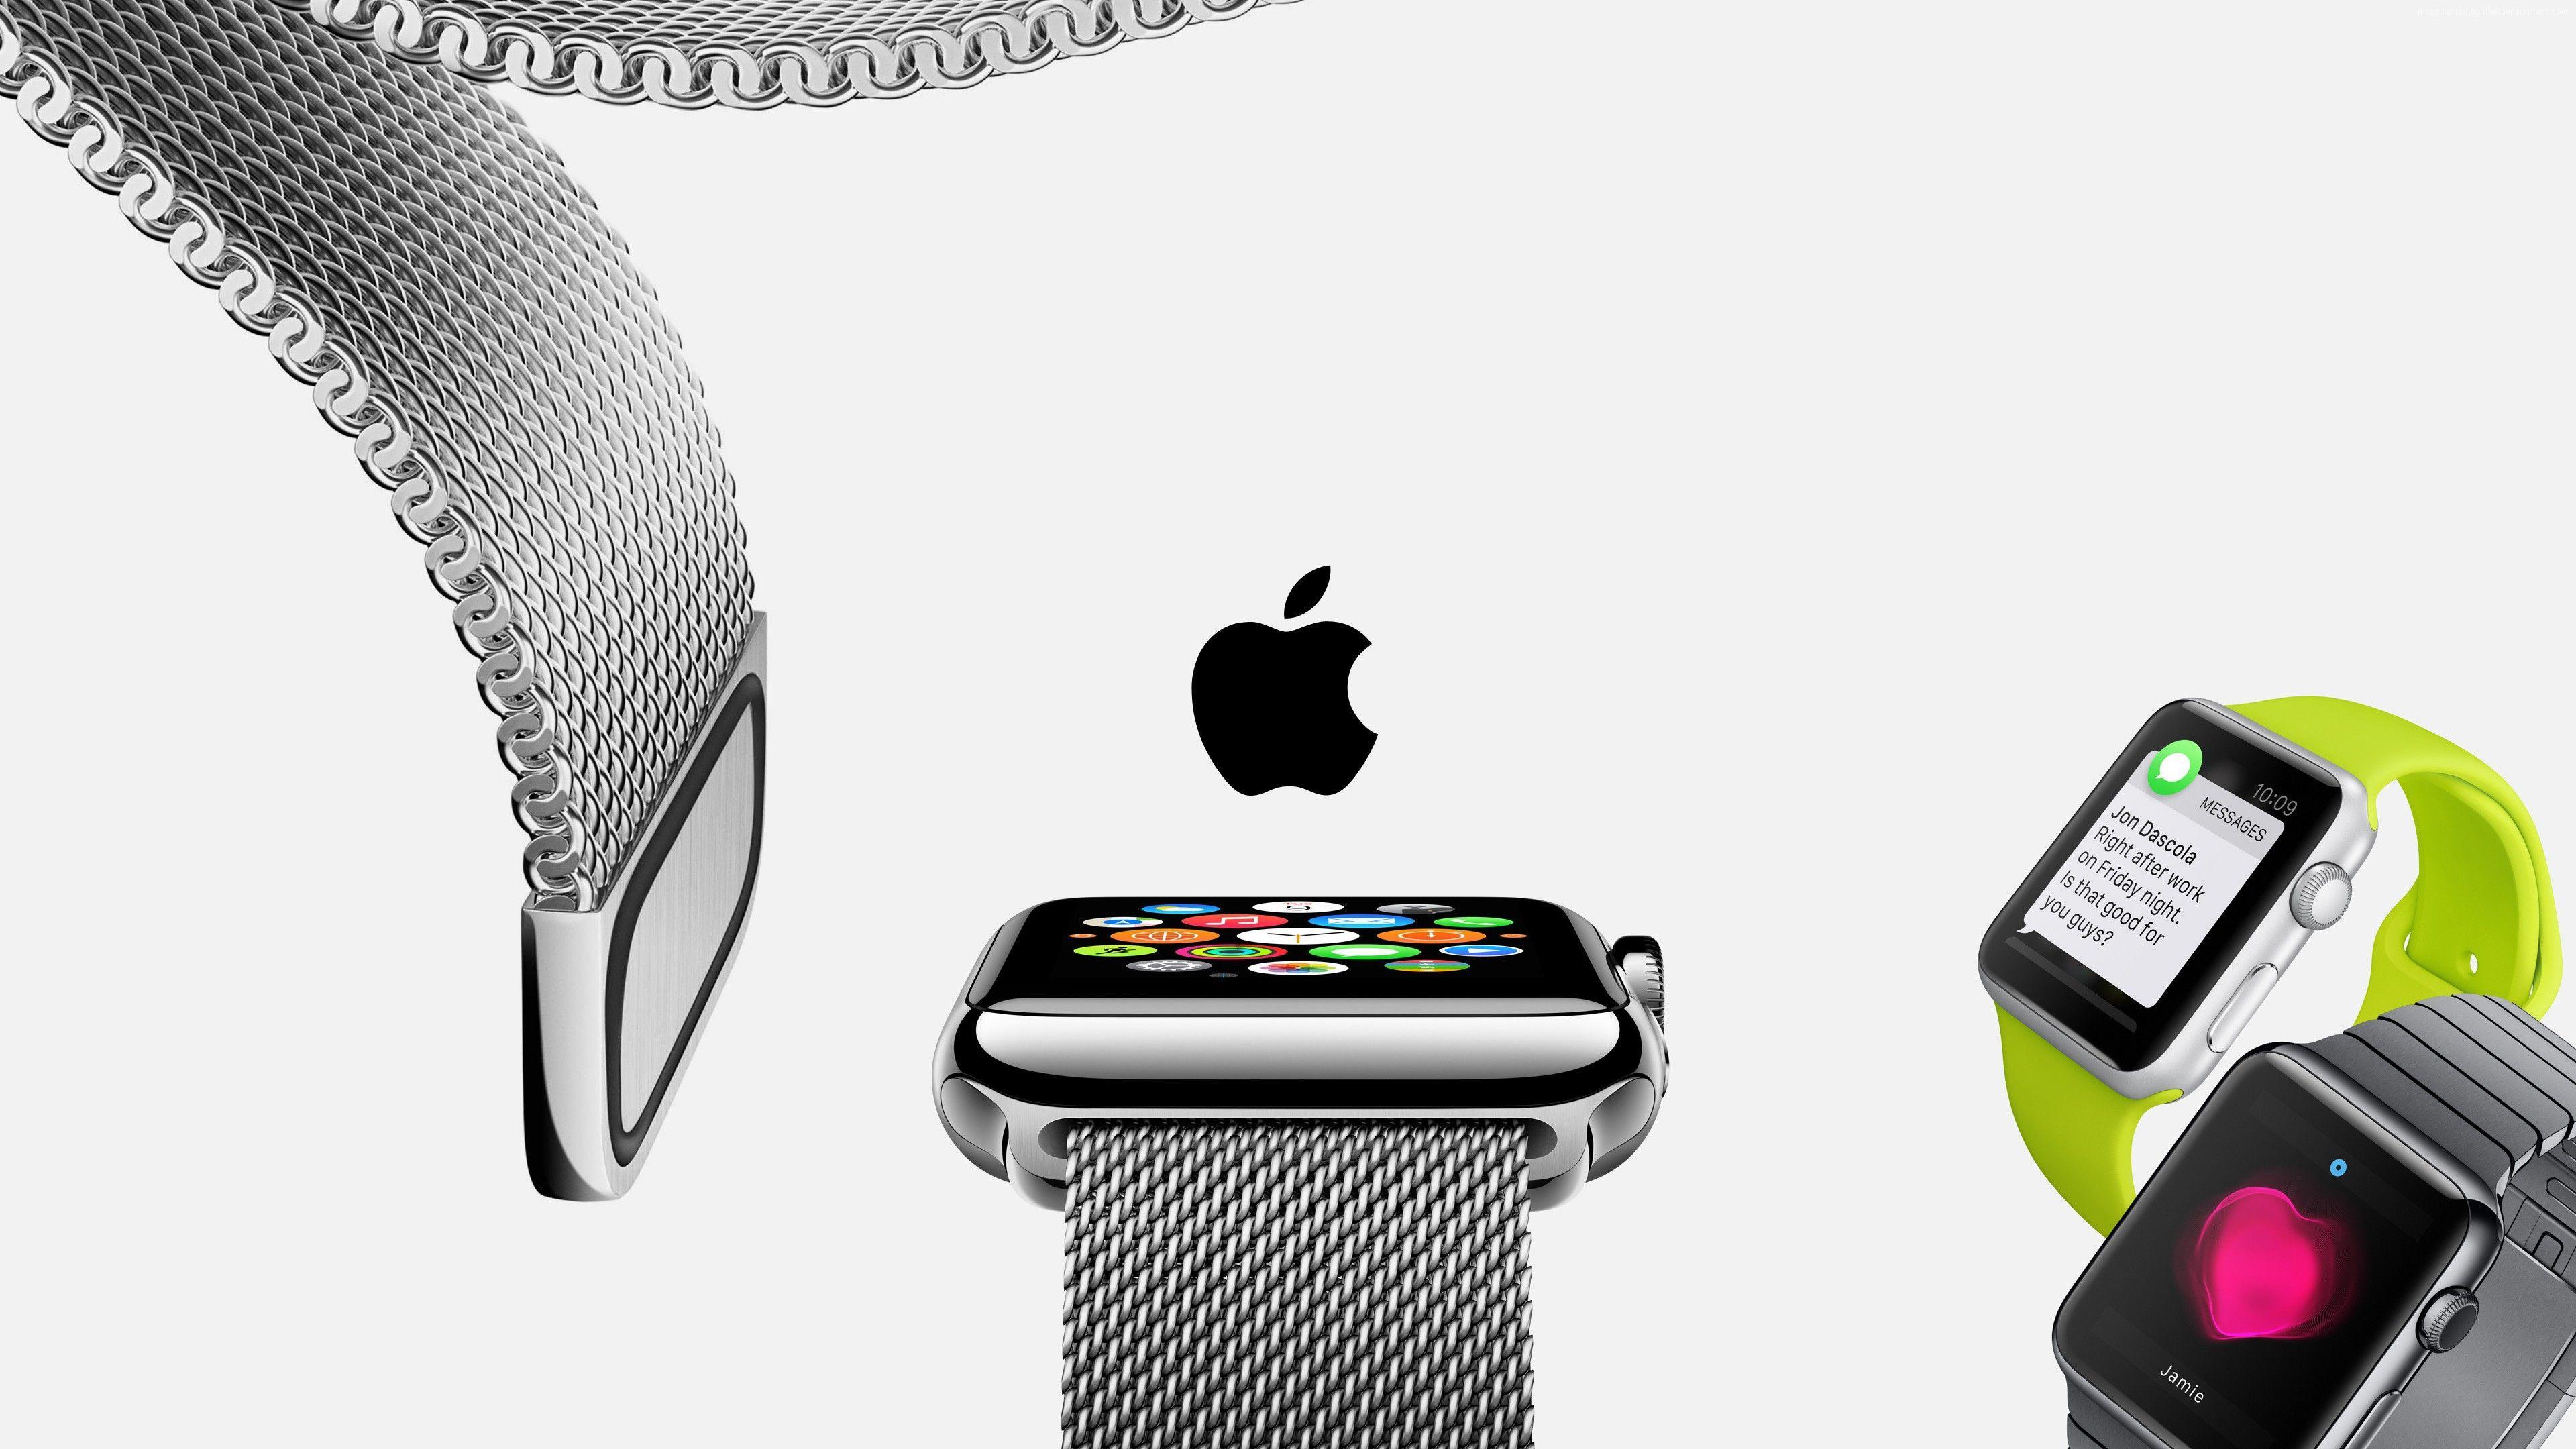 Apple Watch Wallpapers  Wallpaper Cave